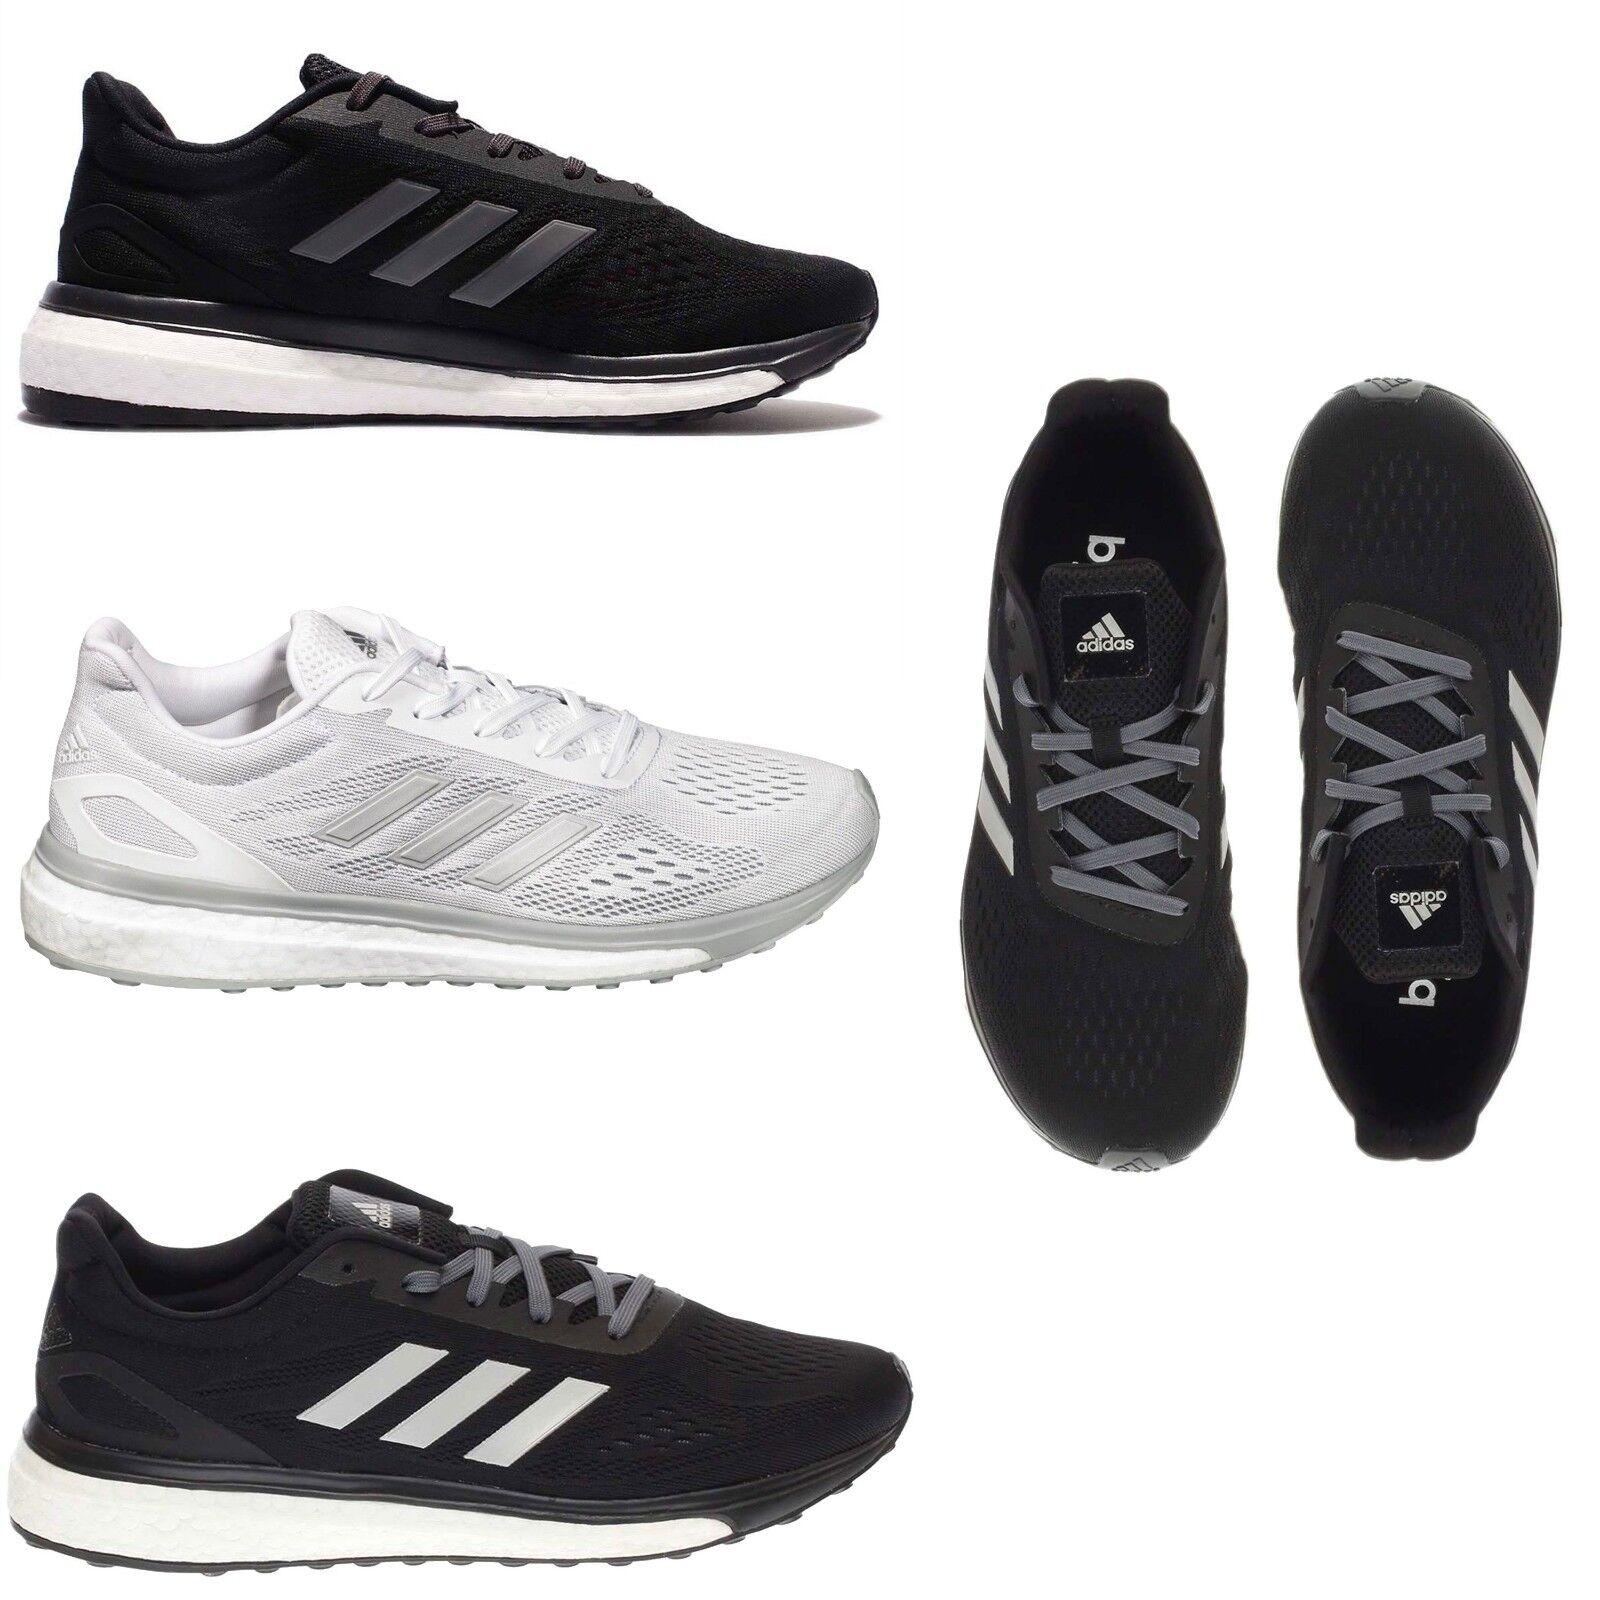 Adidas donna Athletic scarpe Response LT W Running scarpe nero